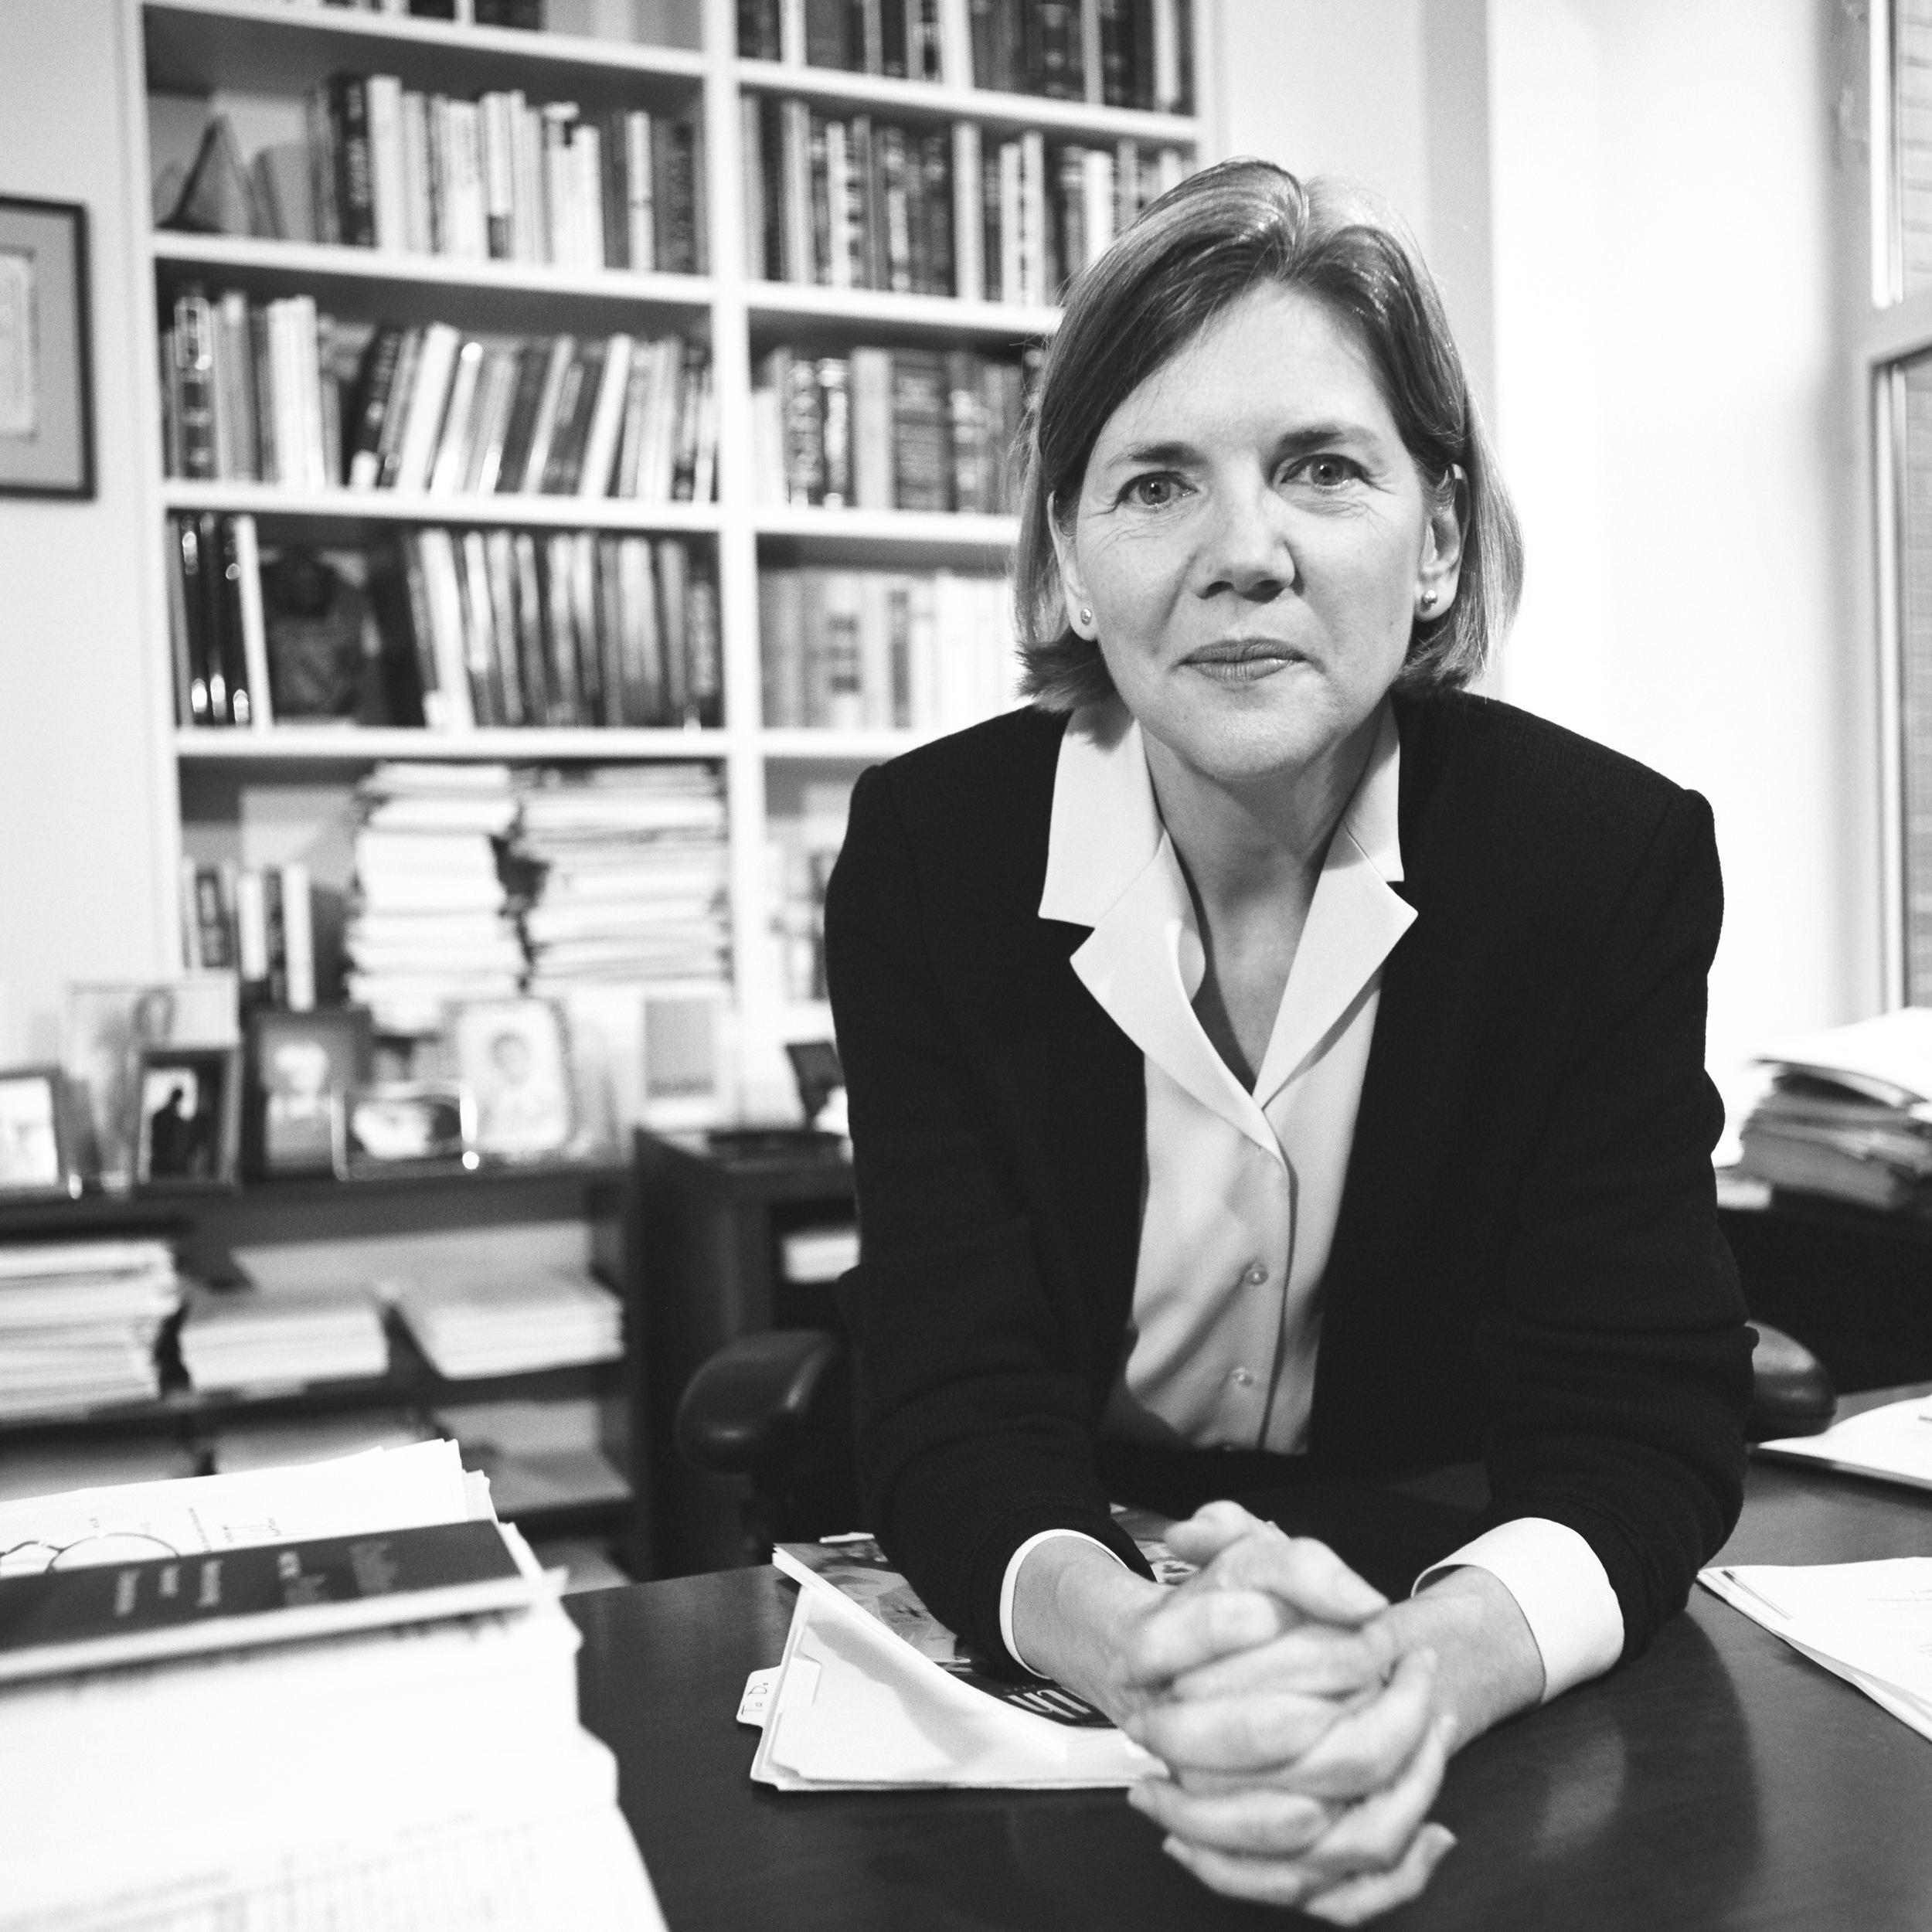 Elizabeth Warren at Harvard